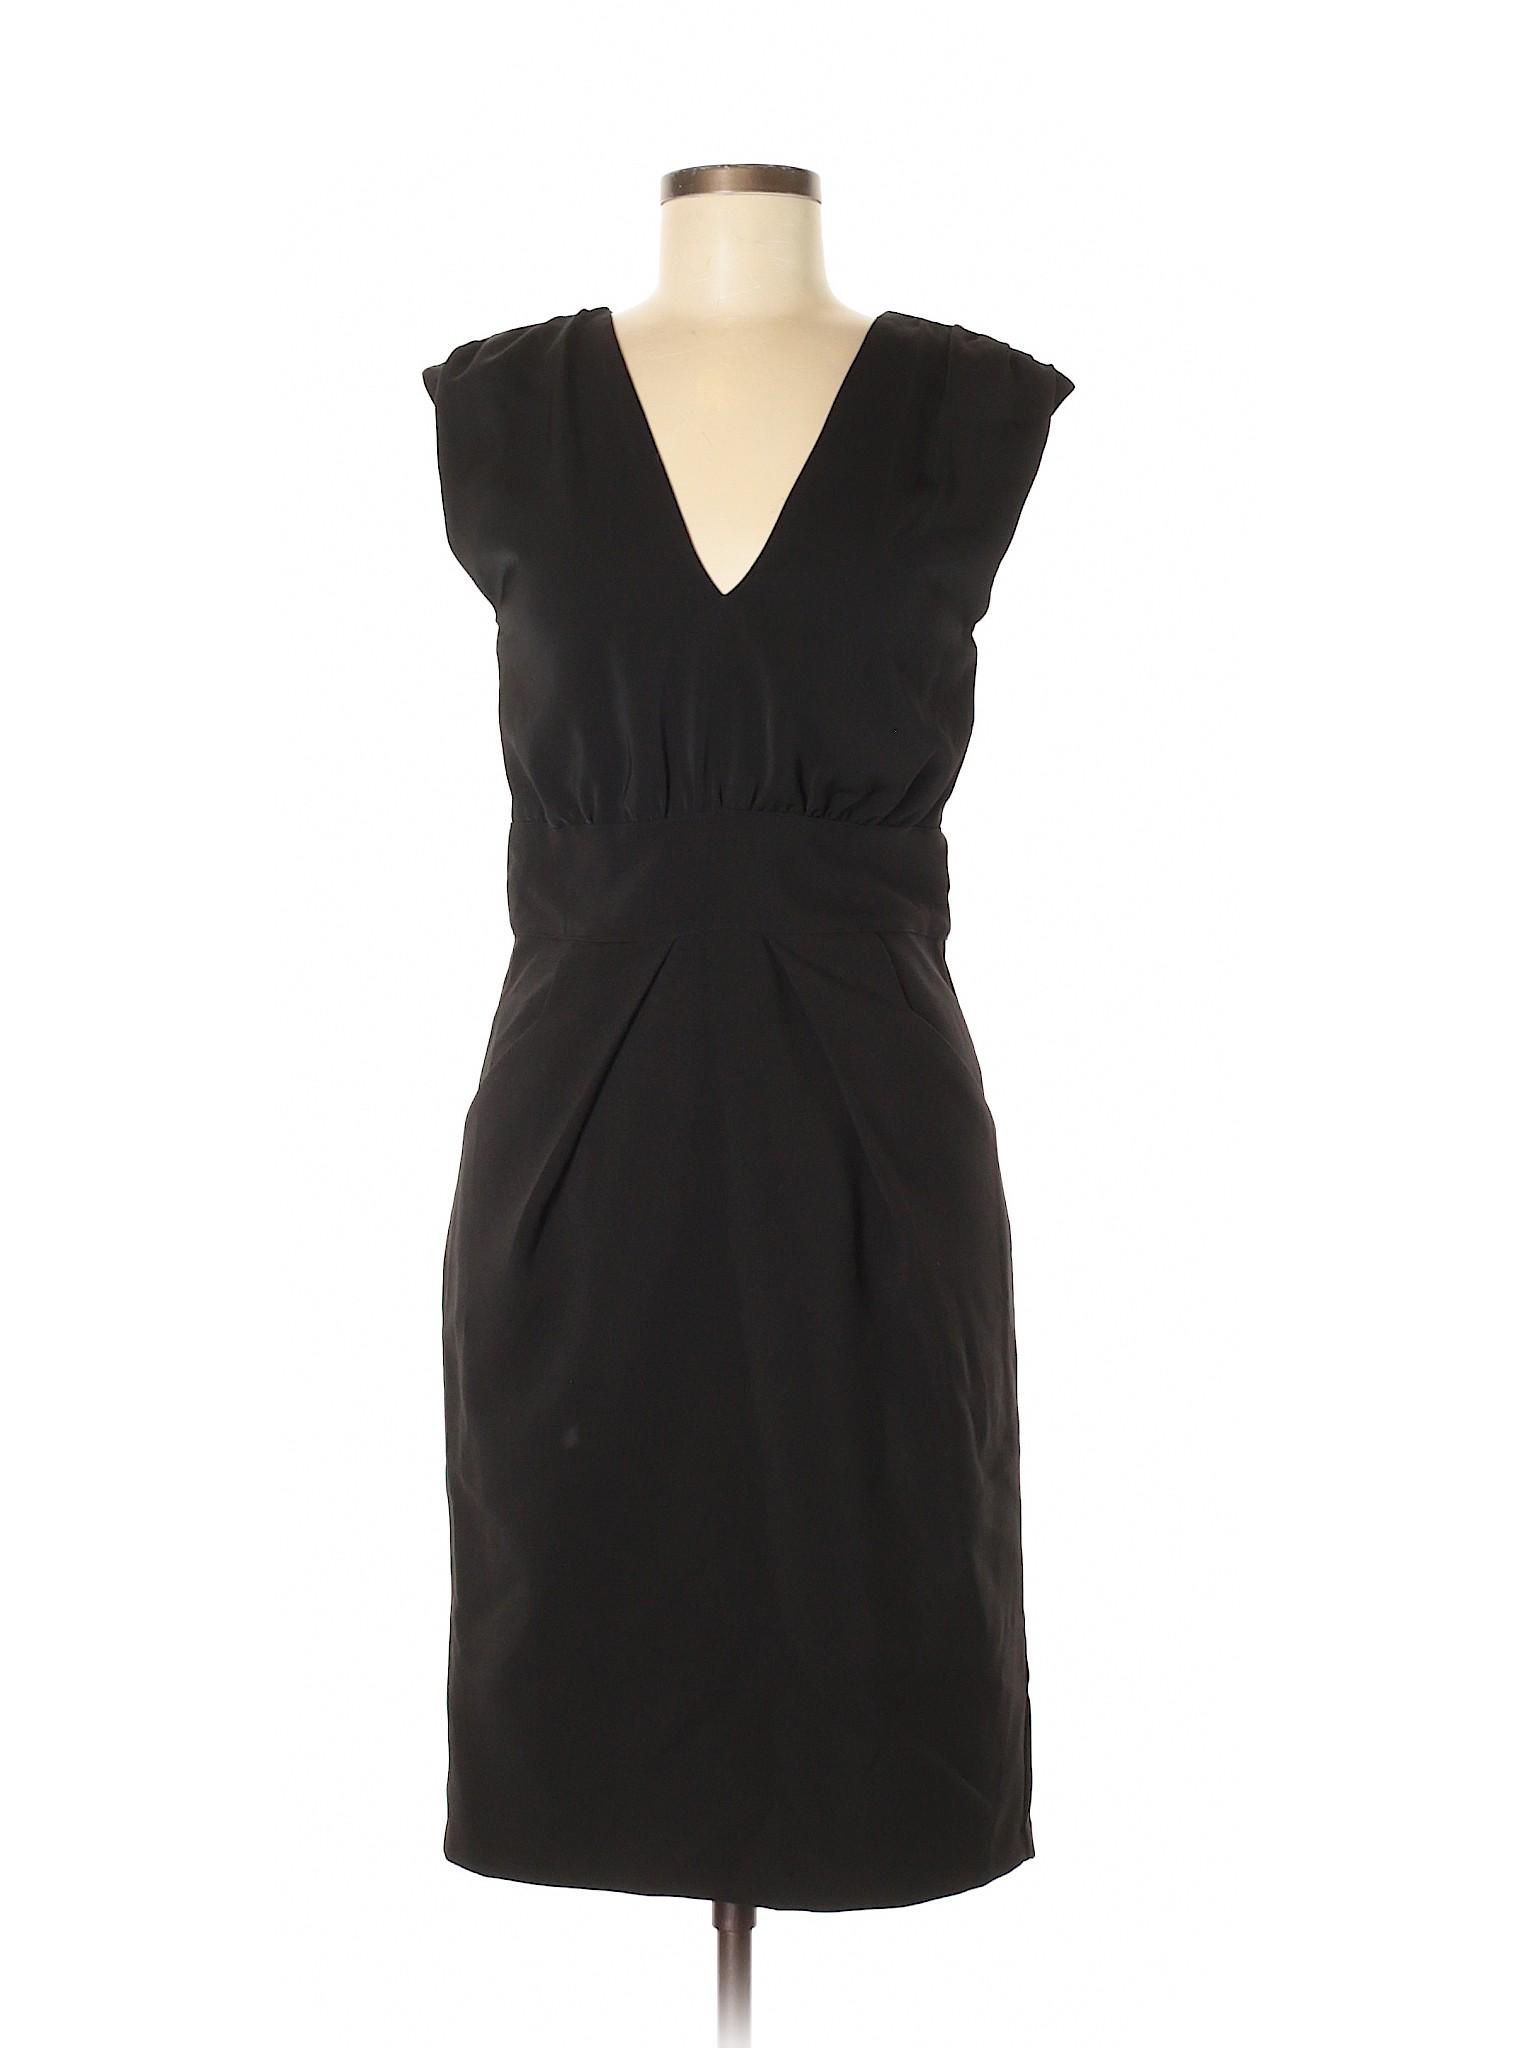 Casual Winter Boutique Aiden Dress amp; Ava PzqfS